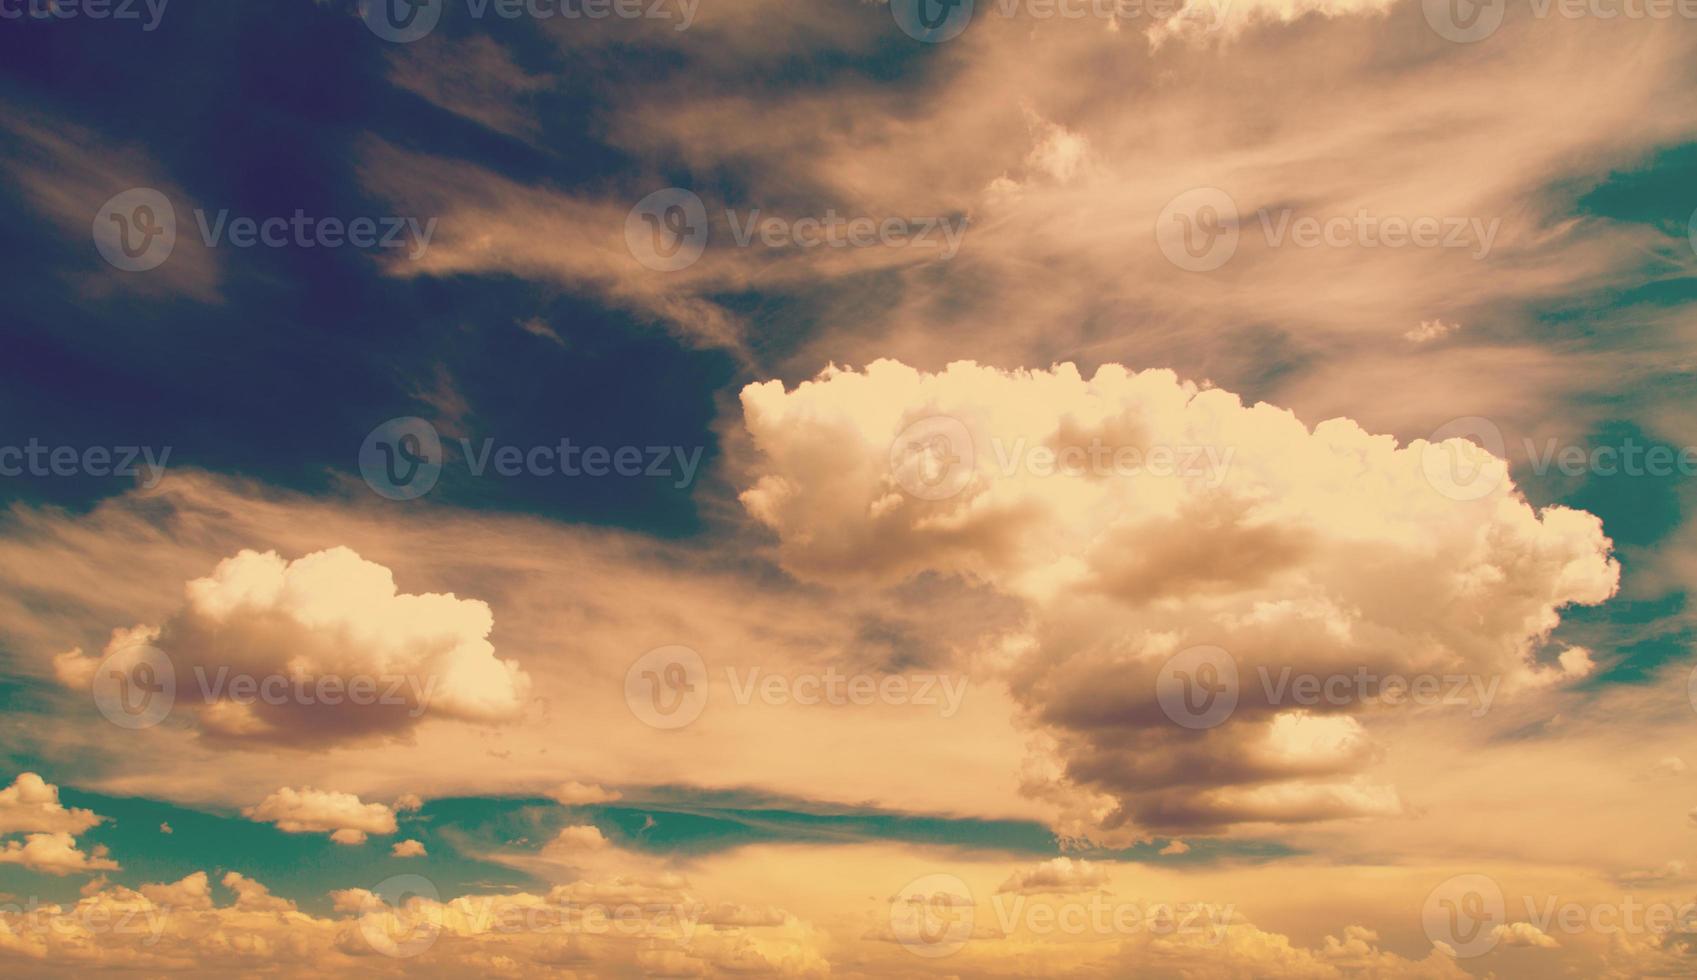 witte pluizige wolken boven blauwe lucht, gefilterde instagram-look. foto